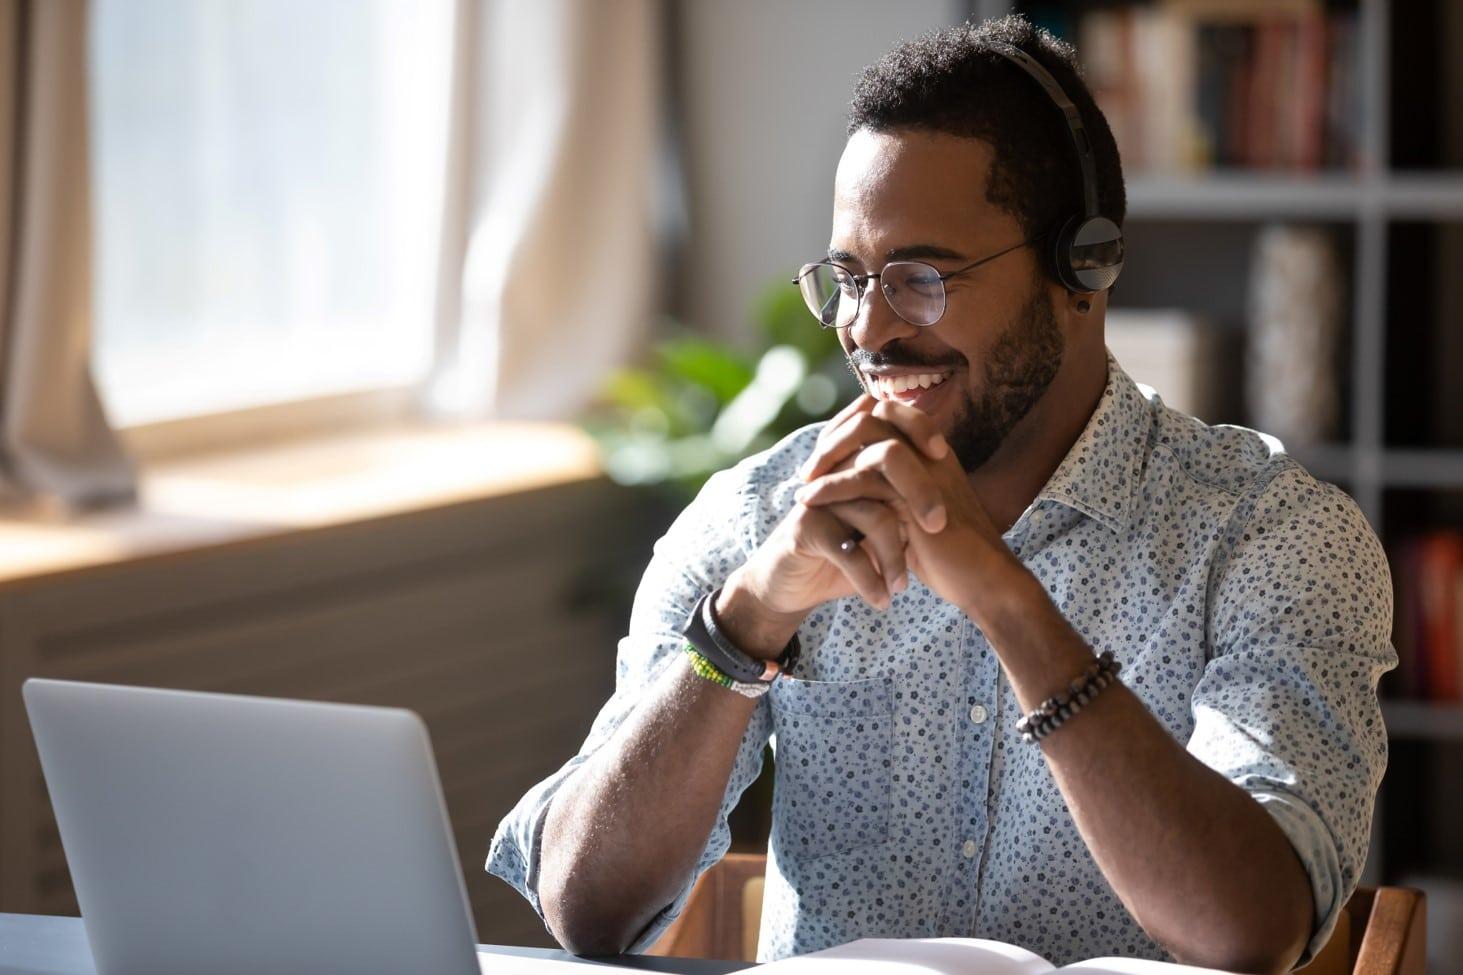 Man looking at laptop managing connectivity